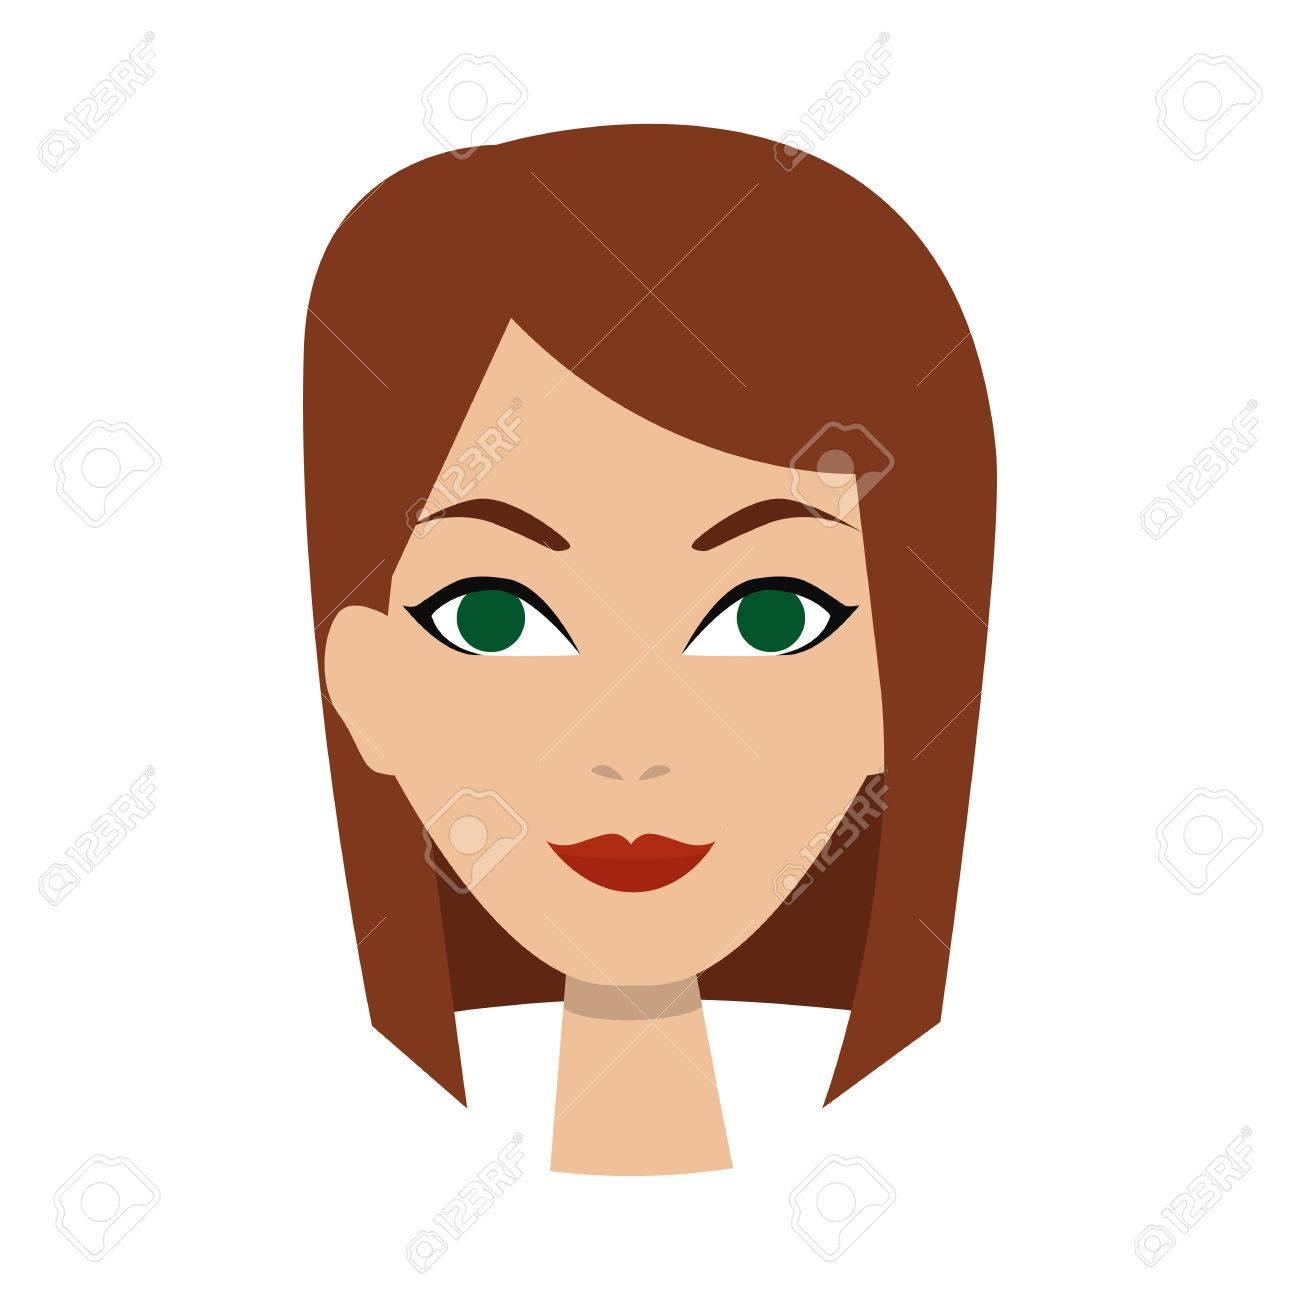 vector girl icon woman avatar face icon cartoon style stock rh 123rf com cartoon woman into alligator mouth cartoon woman fixing her hair